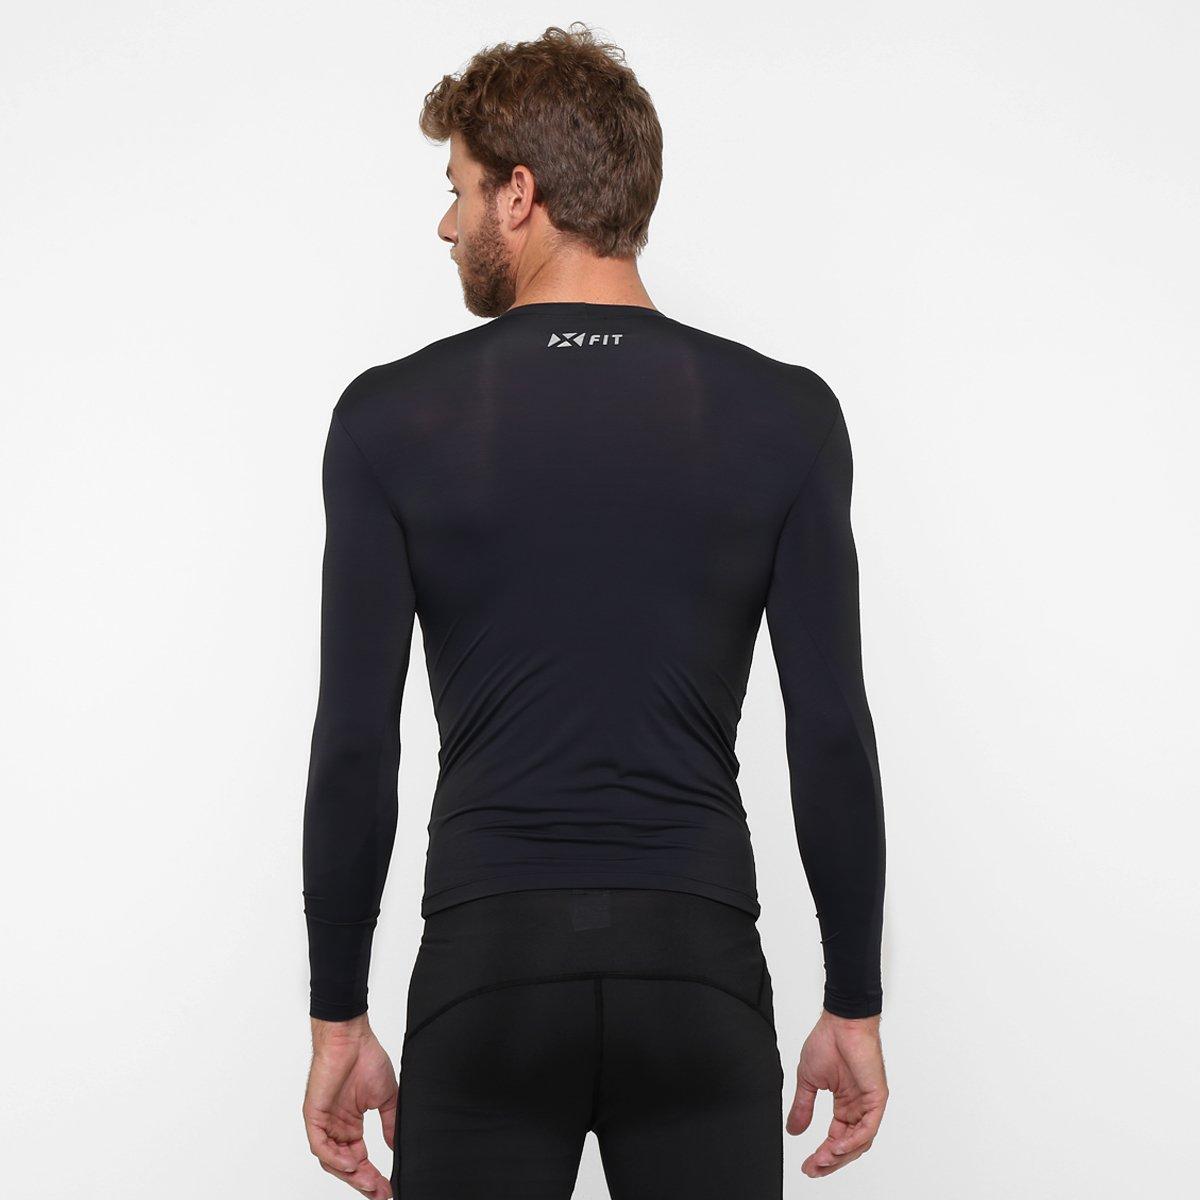 Camiseta Segunda Pele Woom X-Fit - Compre Agora  c7c3874a3dd99